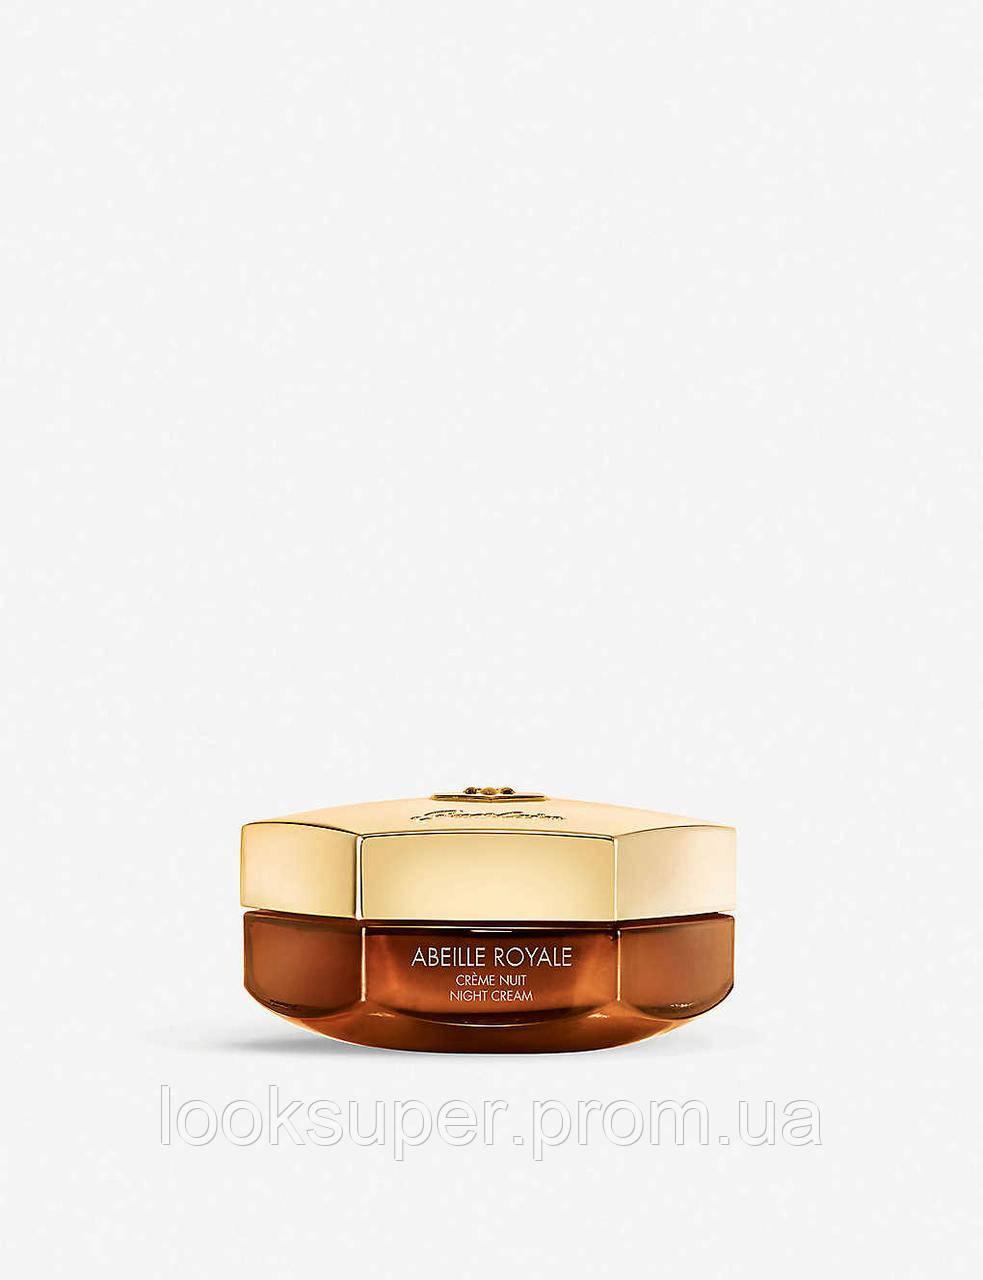 Ночной крем Guerlain Abeille Royale Night Cream (50ml)